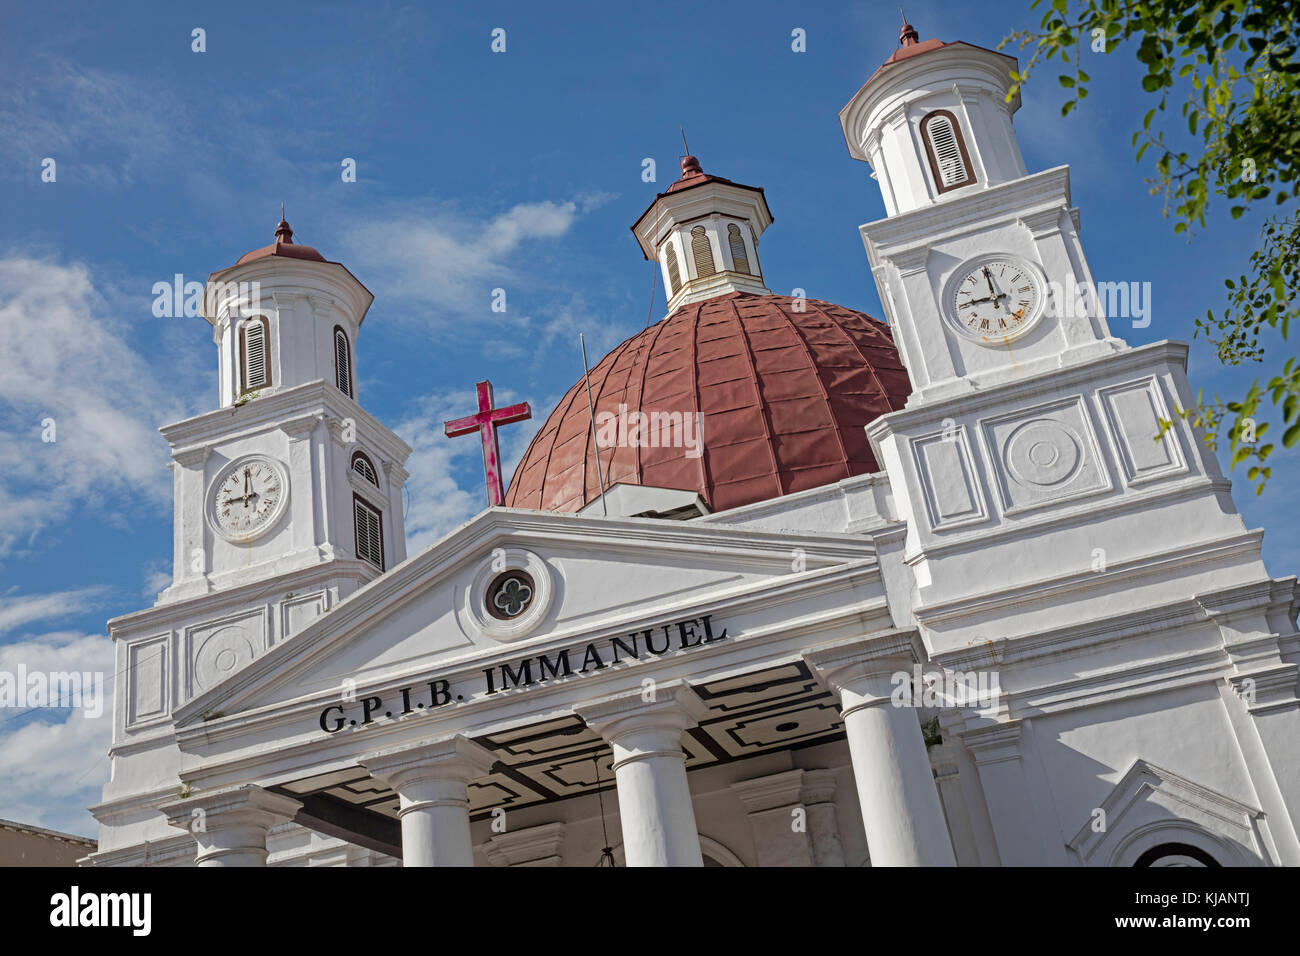 Protestant church in Western Indonesia Immanuel Semarang / Blenduk Church / Gereja Blenduk in Semarang, Central - Stock Image